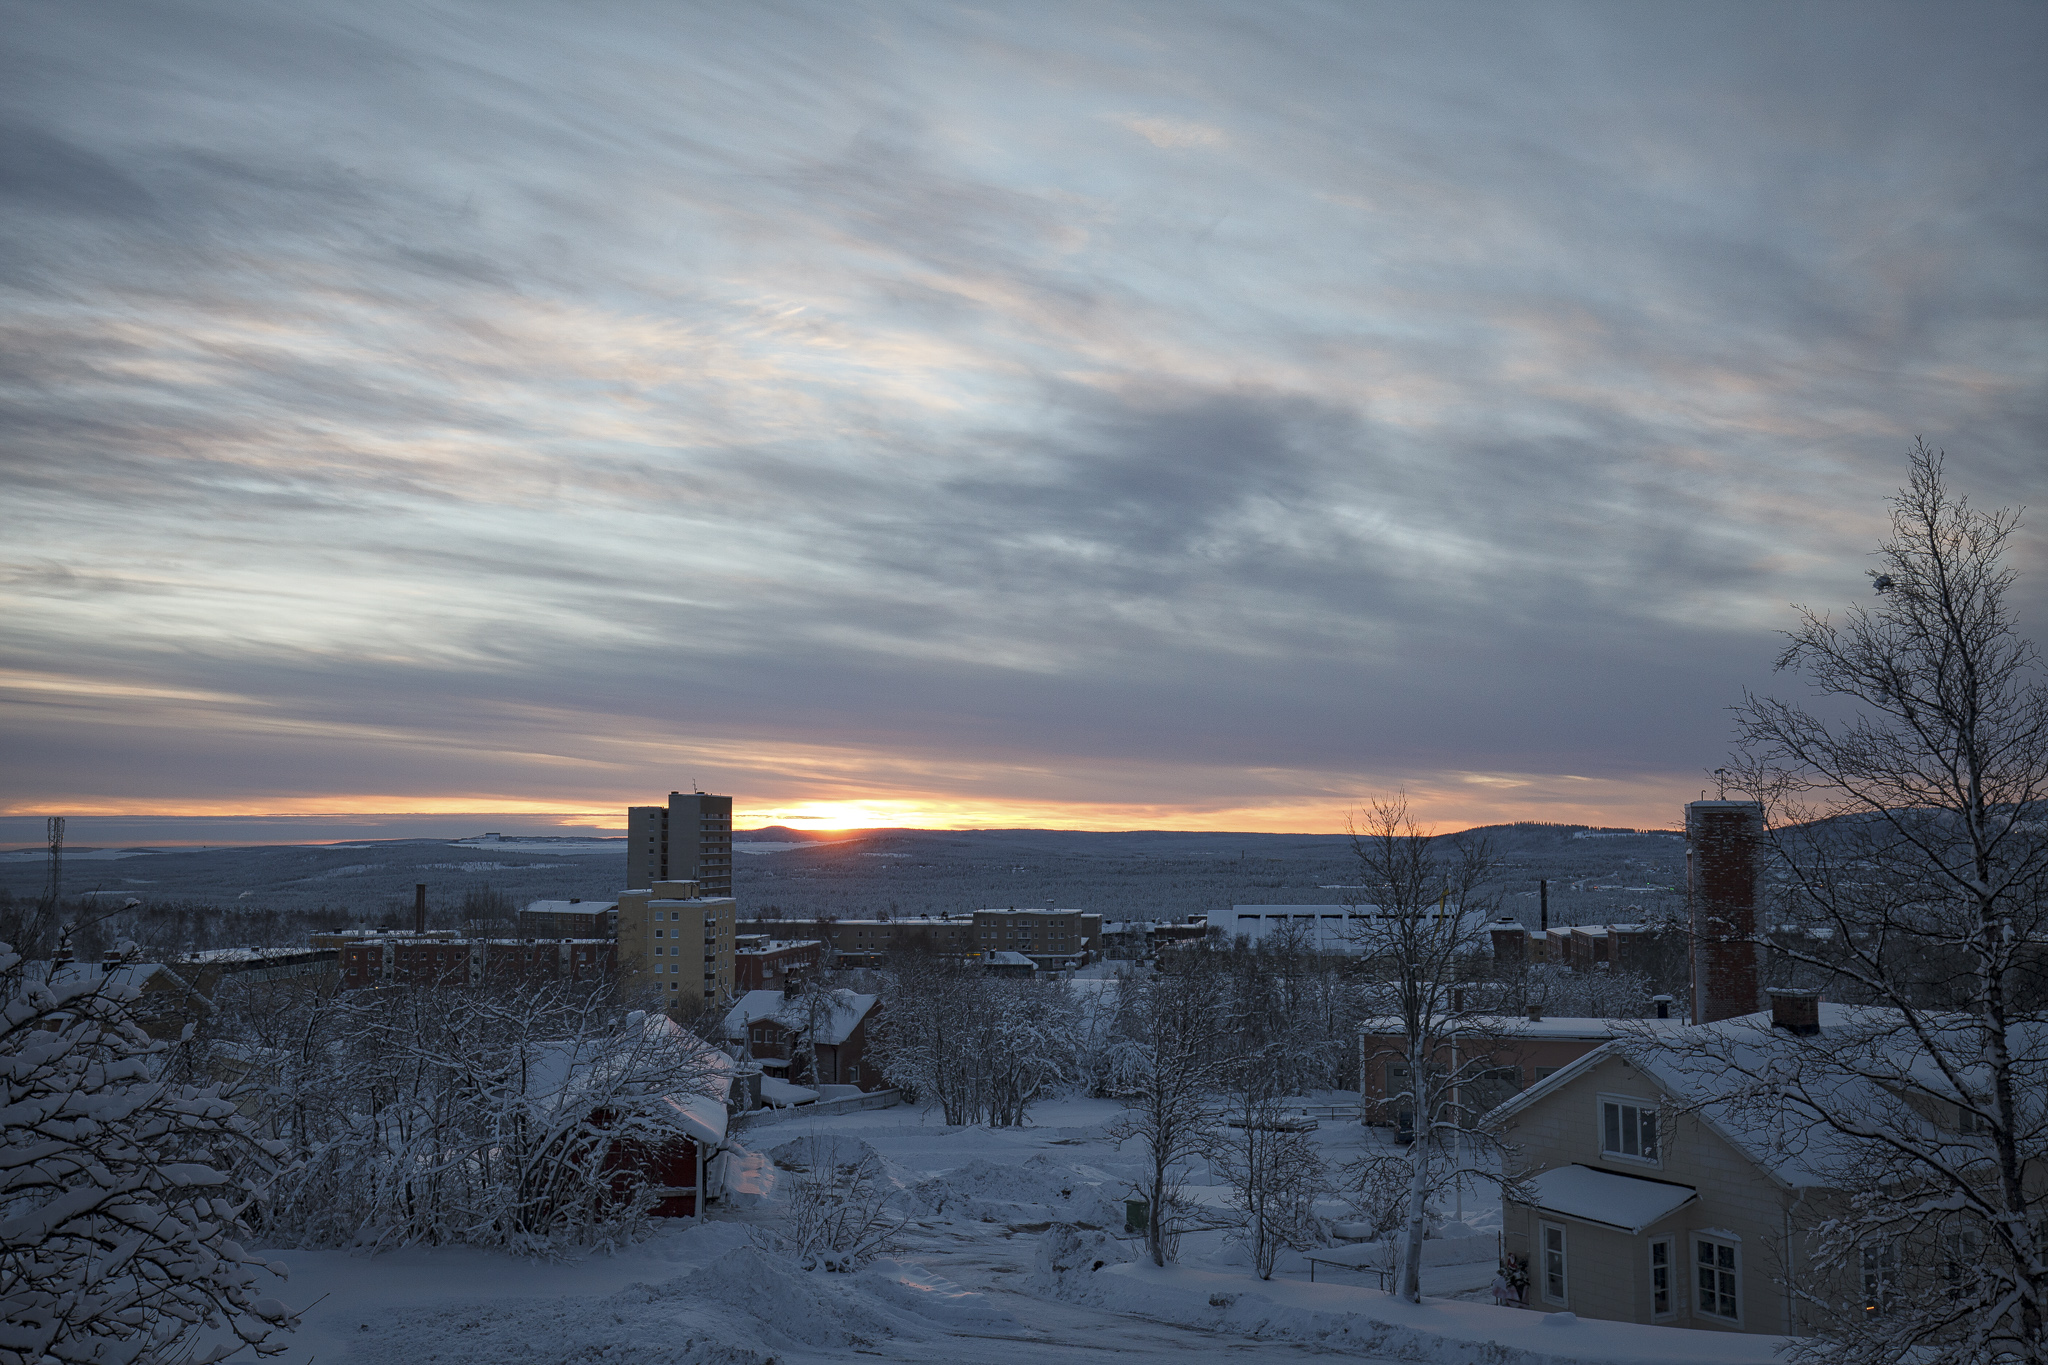 Malberget Sunrise, Canon 5d mark II, 16-35 f/4 IS.